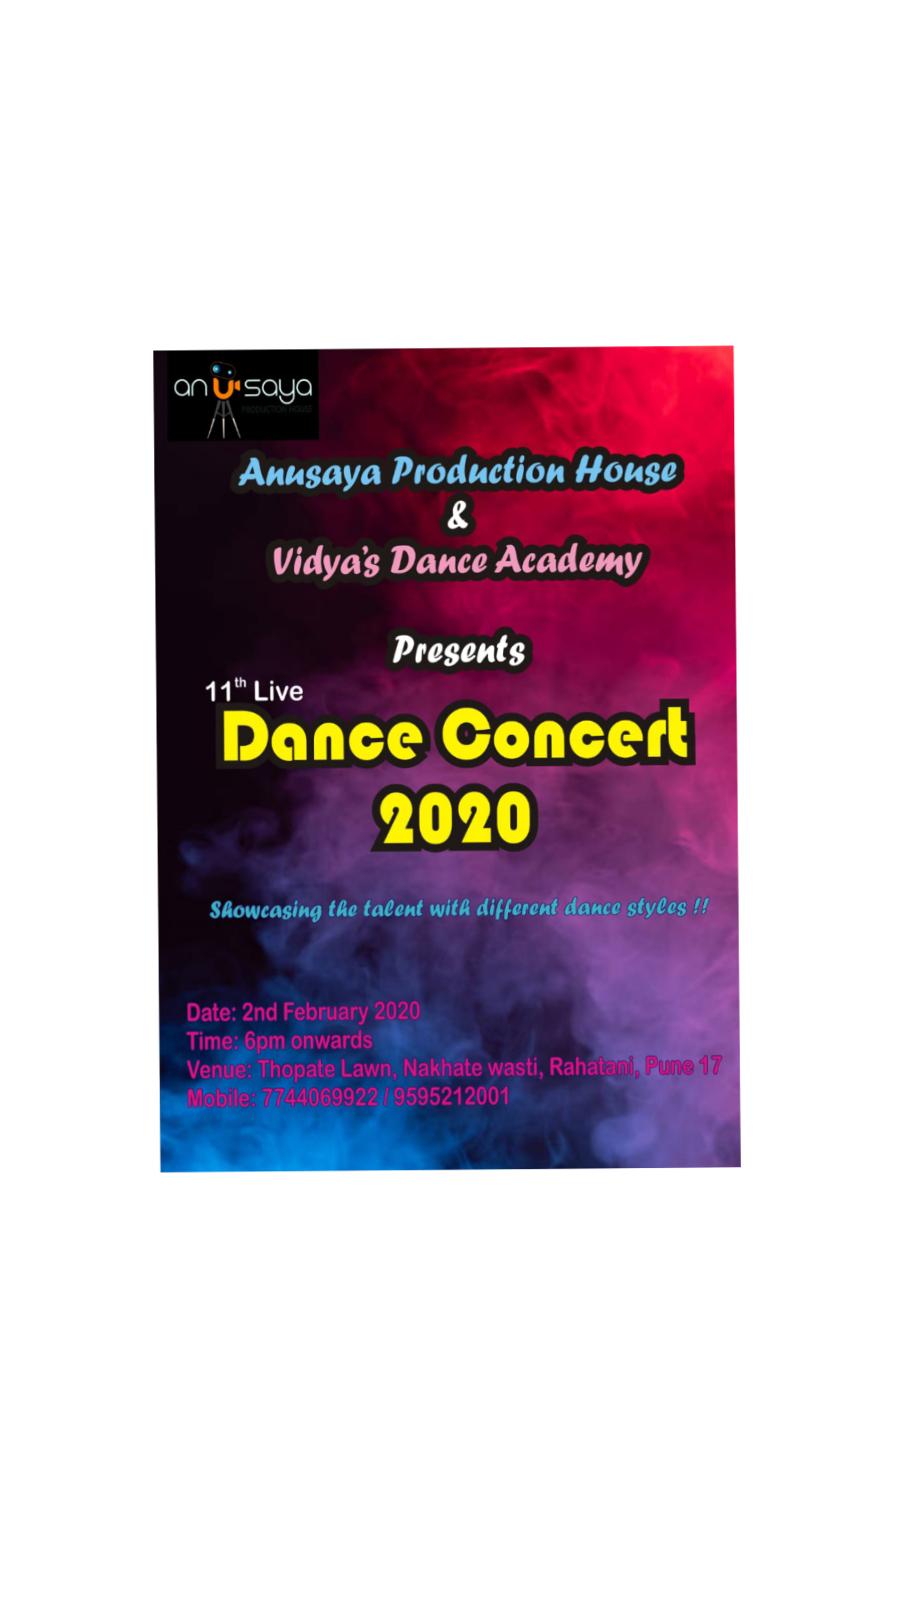 Dance concert in Rahatni Today